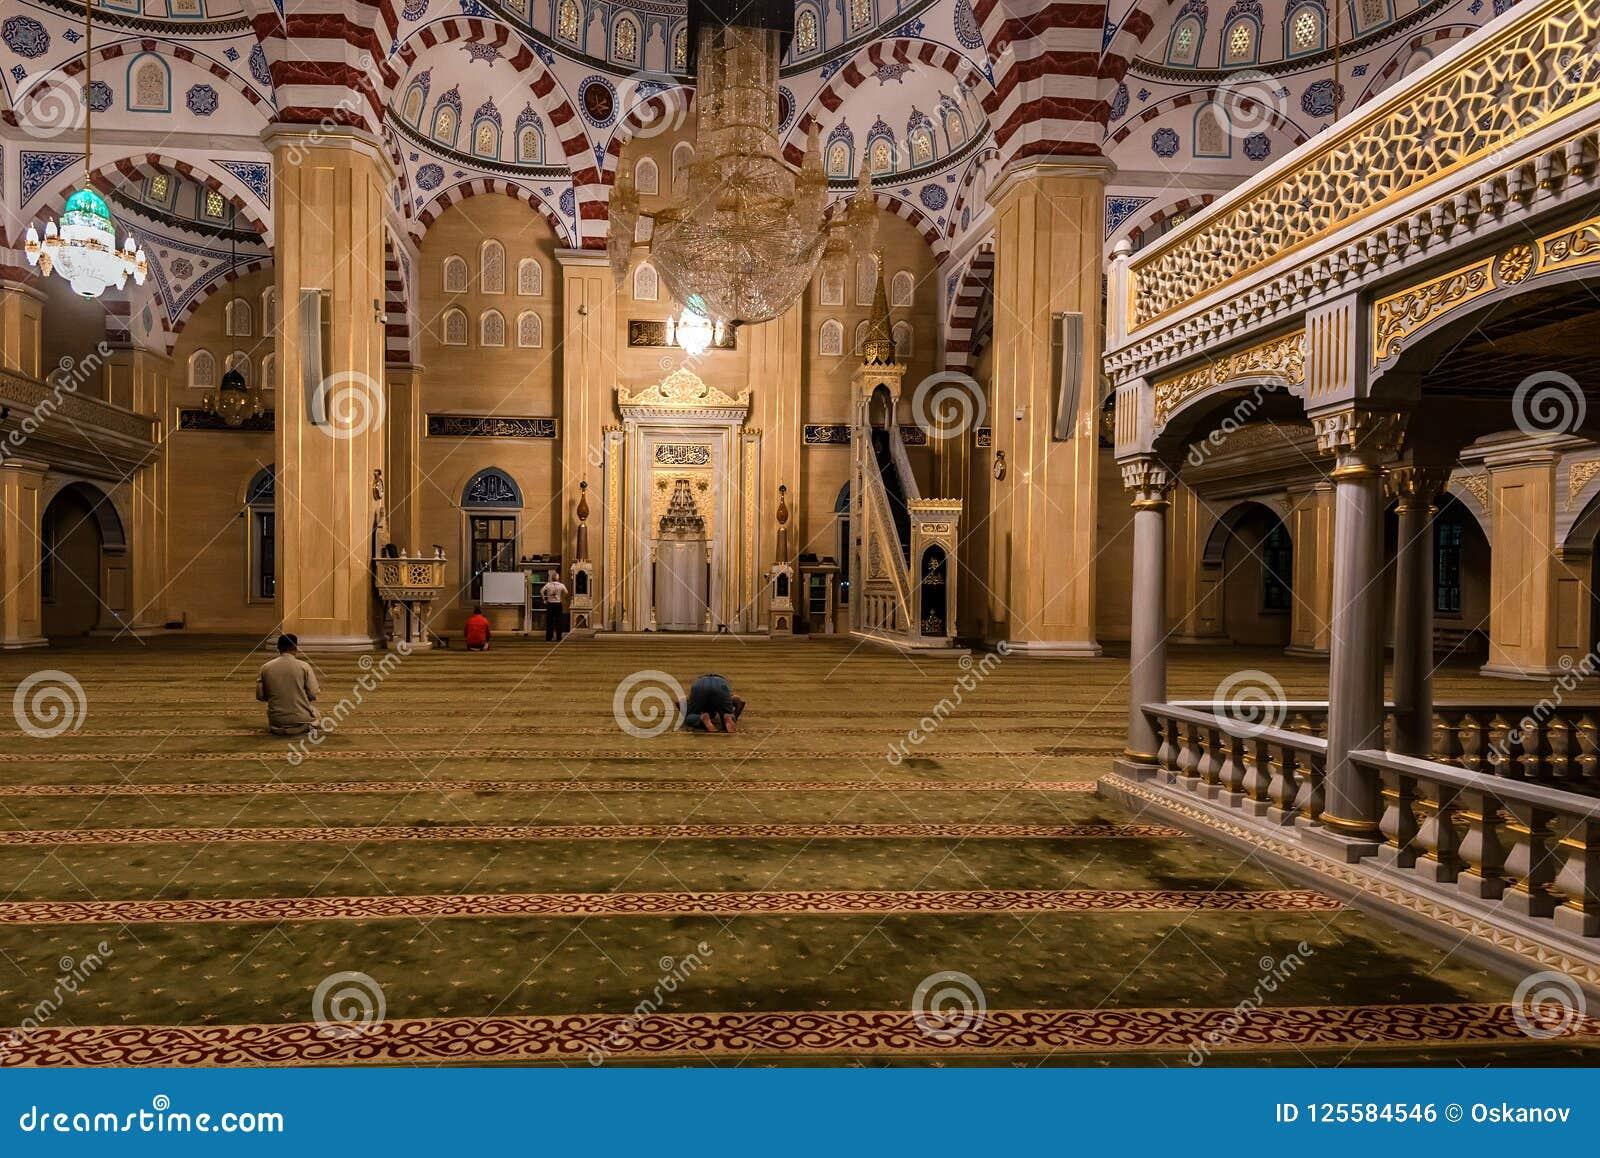 GROZNY, RÚSSIA - 9 DE JULHO DE 2017: Akhmad Kadyrov Mosque em Grozny, Chechnya, Rússia